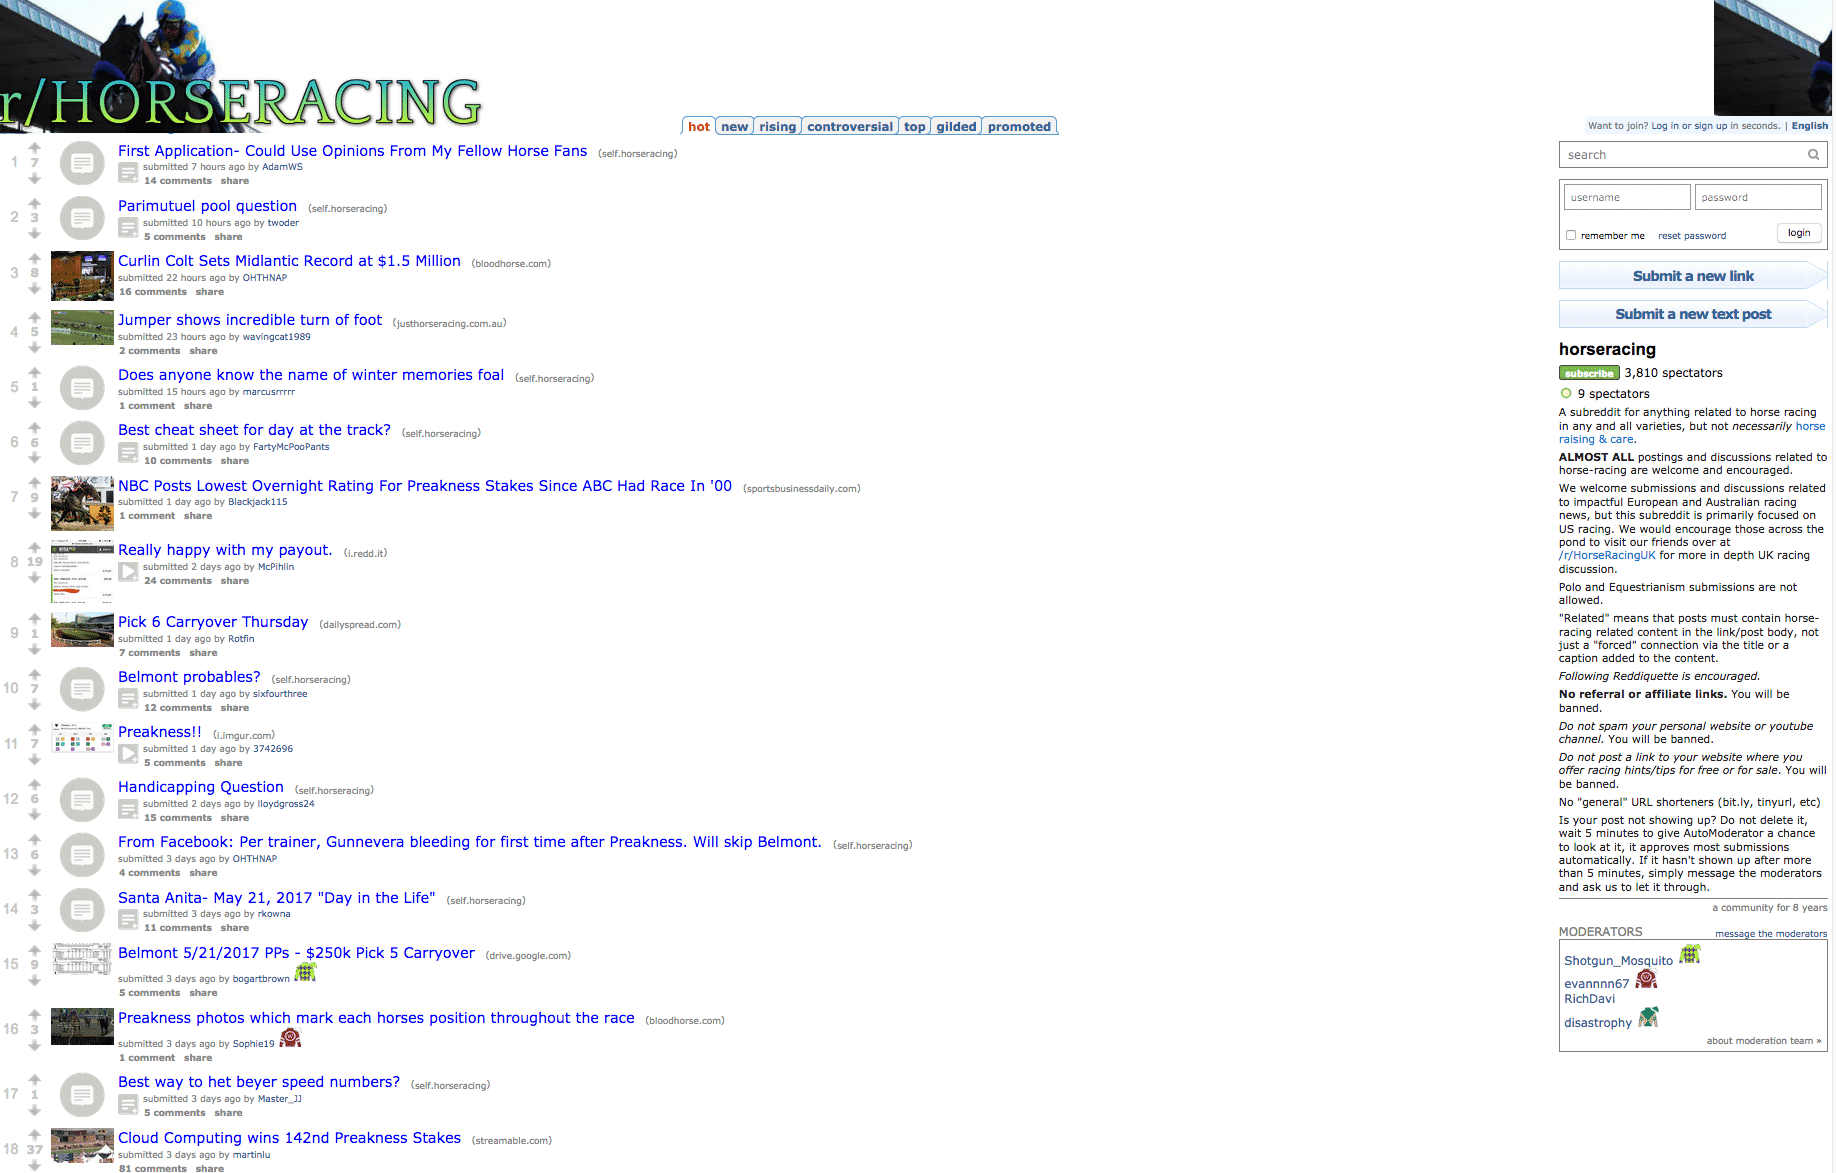 Best Betting Subreddits: Making the Most of Reddit